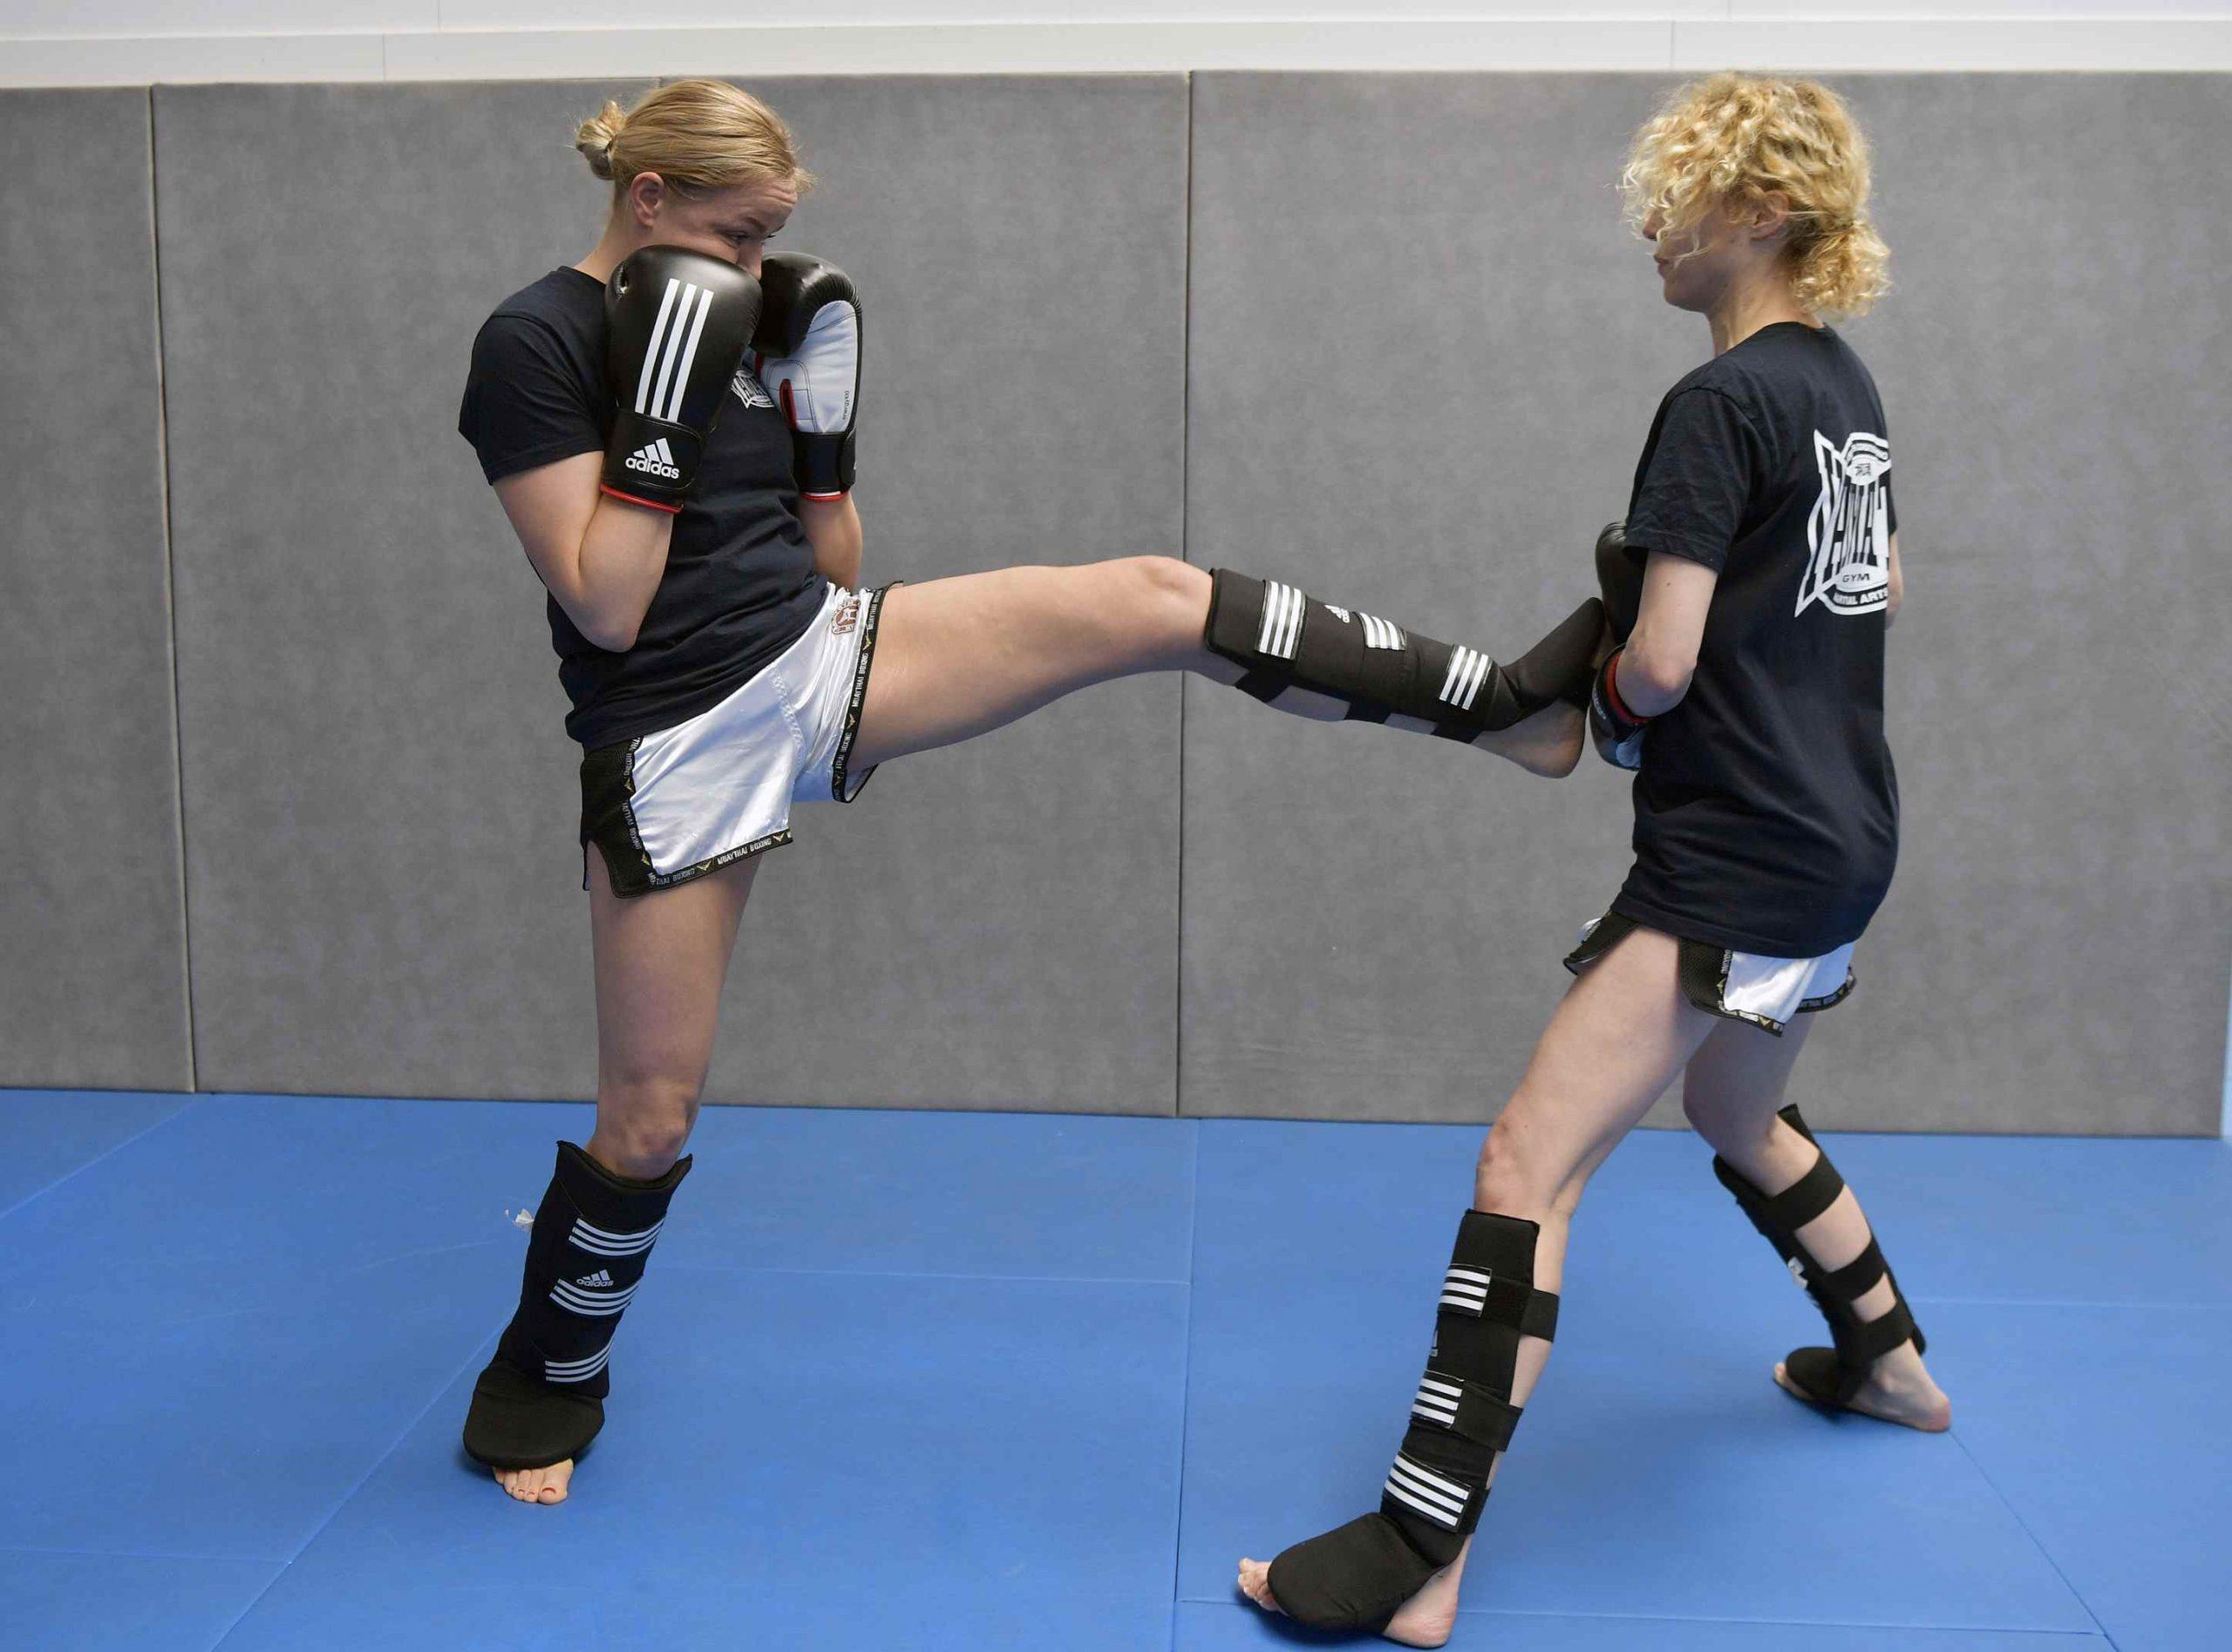 Sportschool Yamato Gym Weesp Kickboksen